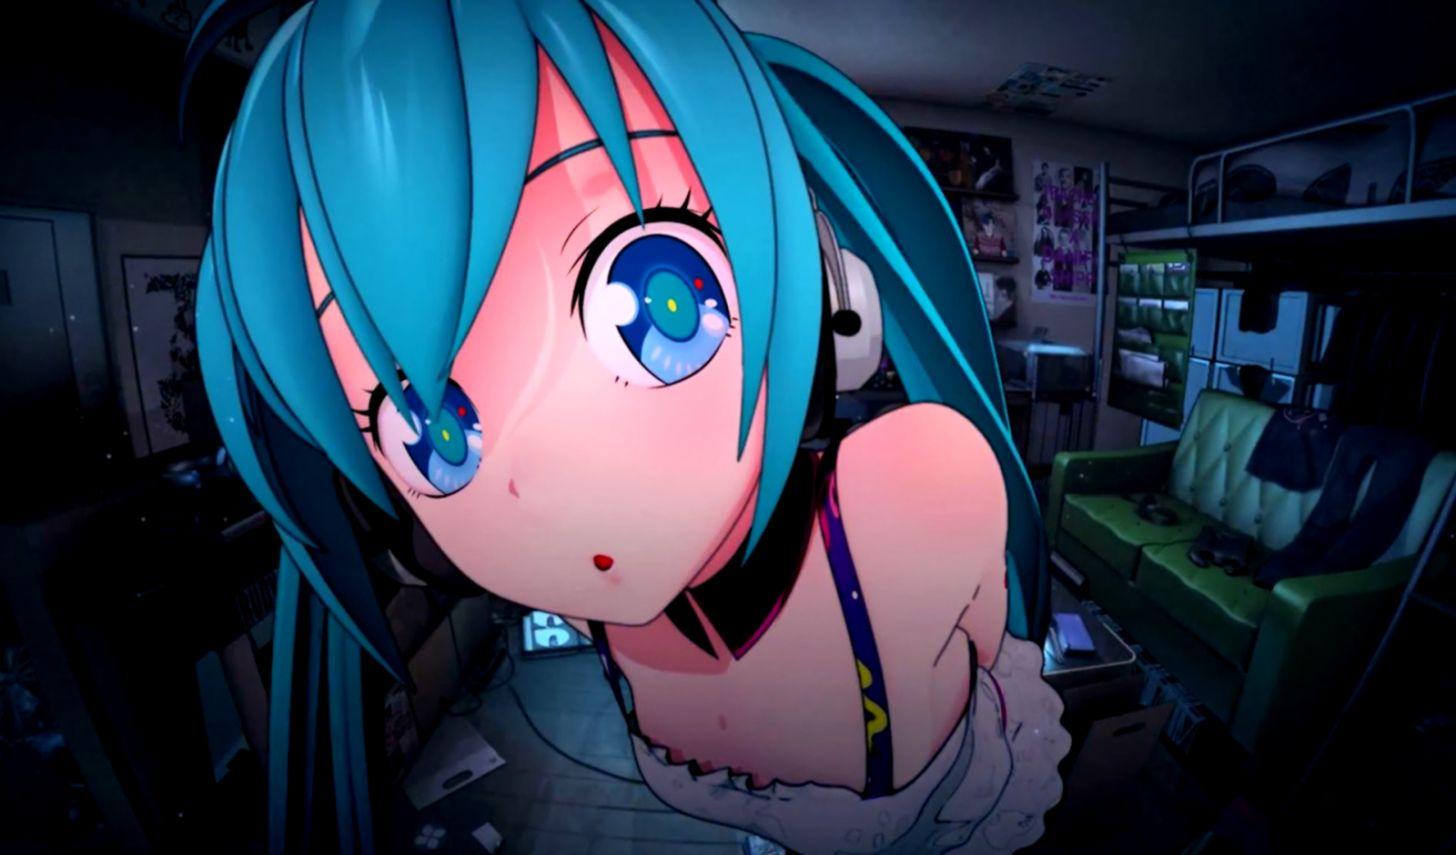 Girl Anime Desktop Wallpaper Hd Wallpapers Gallery - Desktop High Resolution Anime Wallpaper Hd - HD Wallpaper